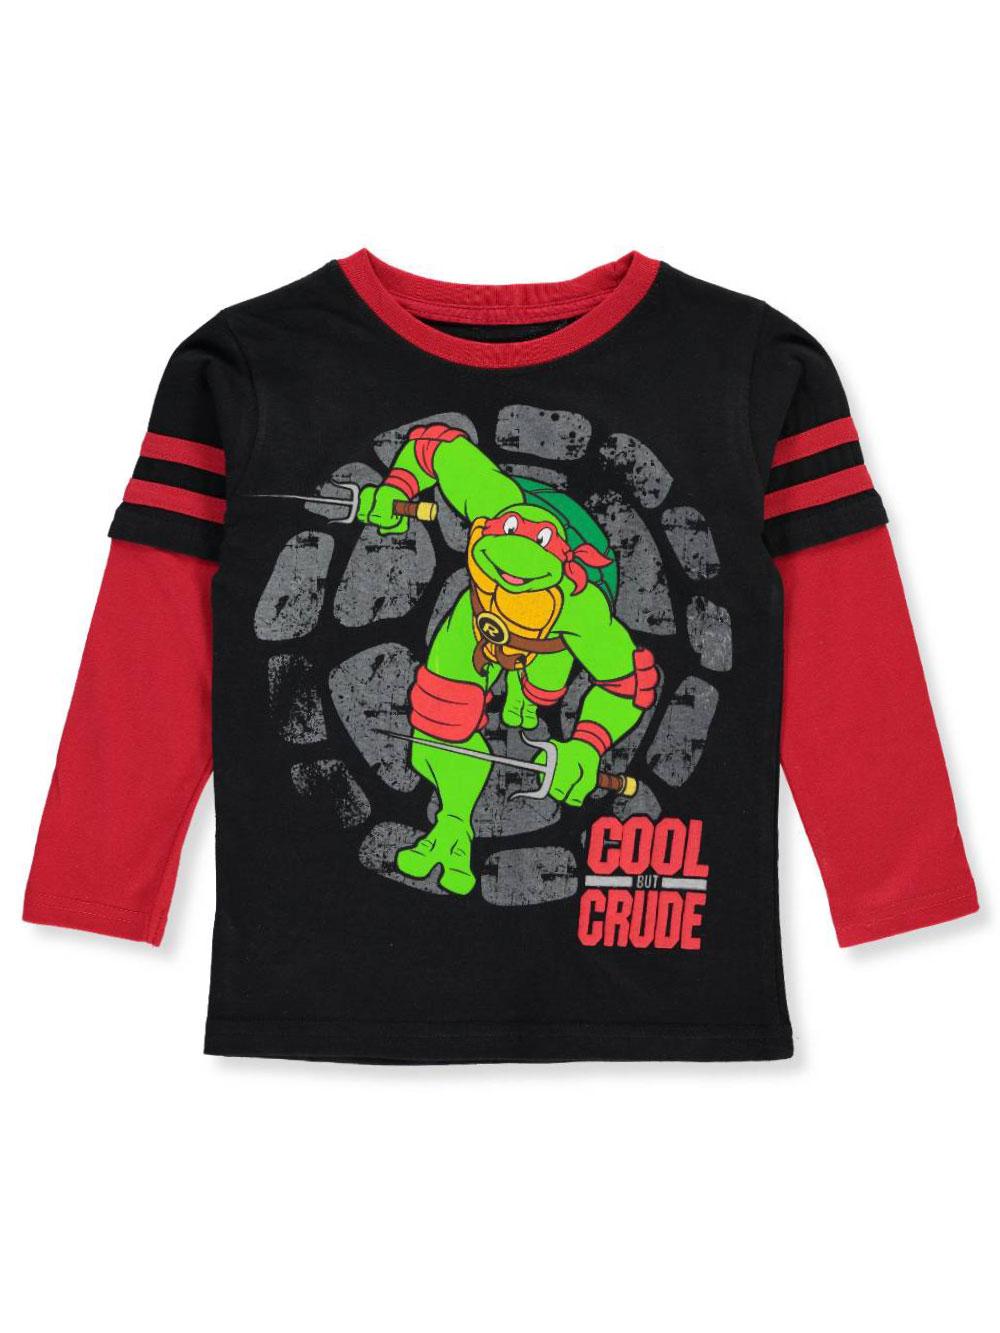 TMNT Teenage Mutant Ninja Turtles Toddler Boys 2 Pack Short Sleeve T-Shirt Set